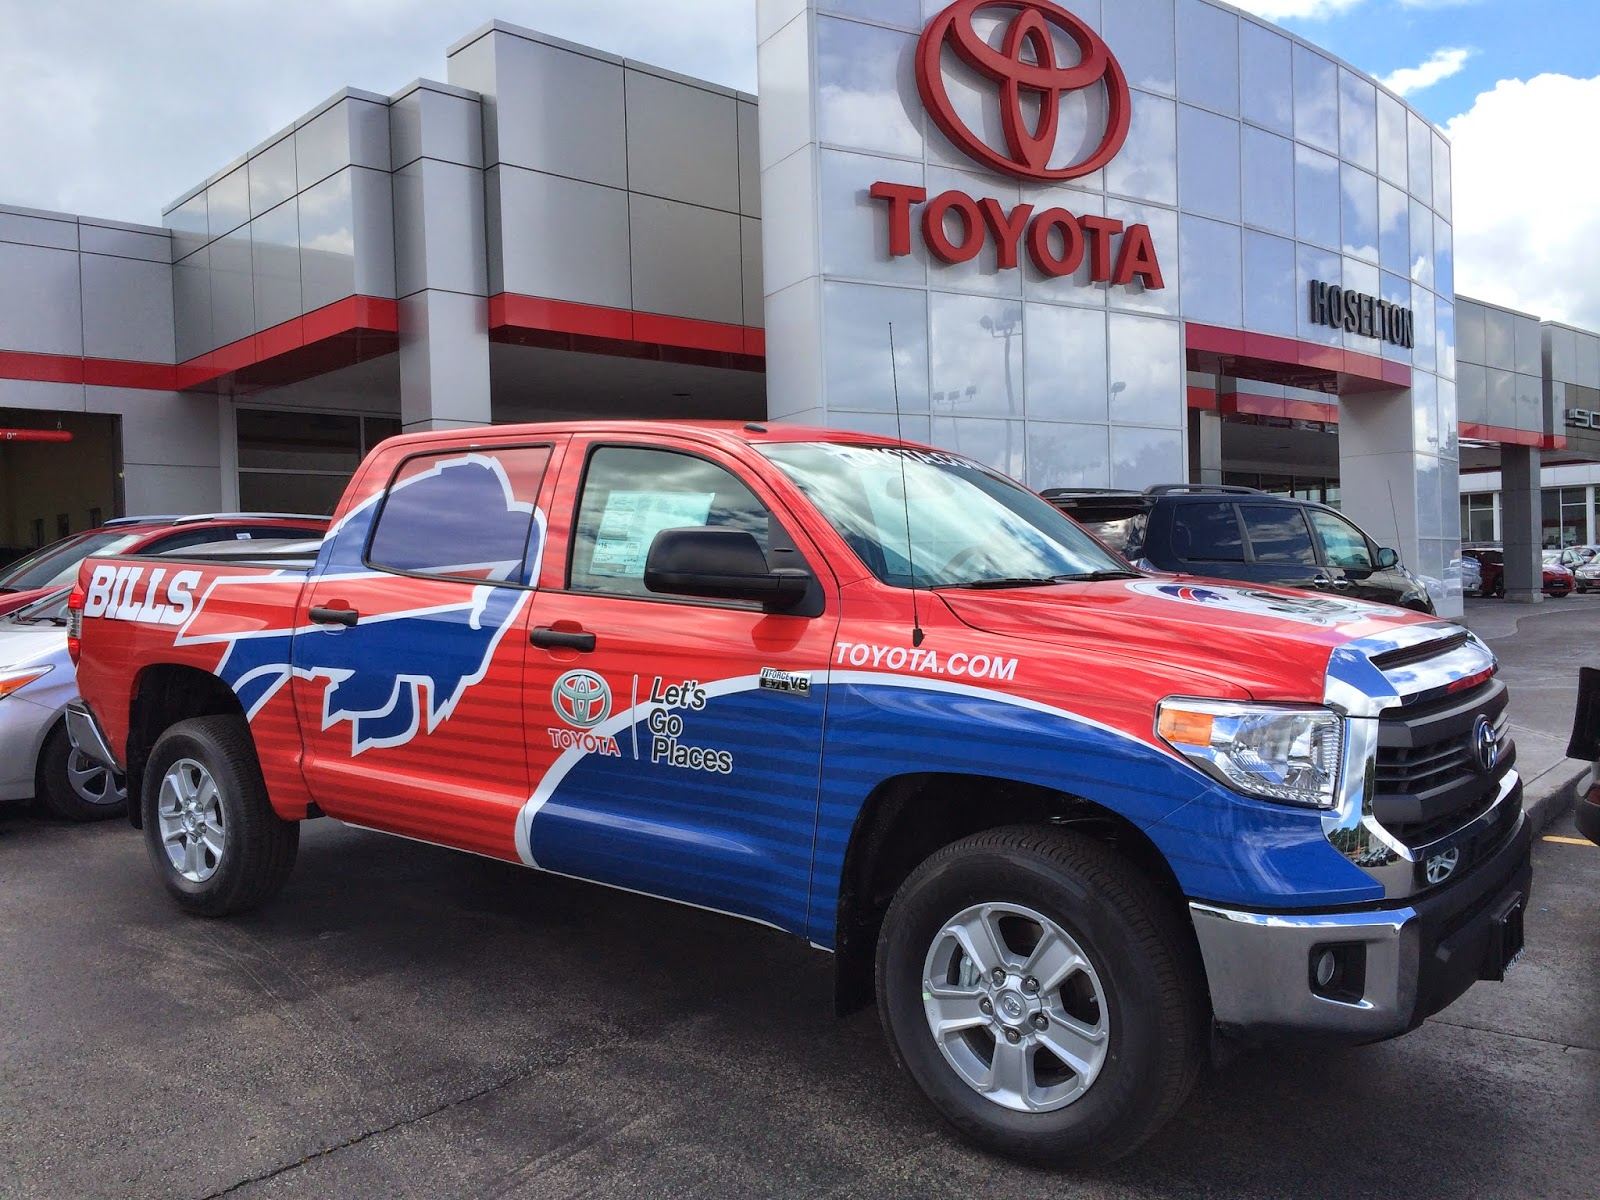 Hoselton Auto Mall: The Buffalo Bills Training Camp Toyota Truck is